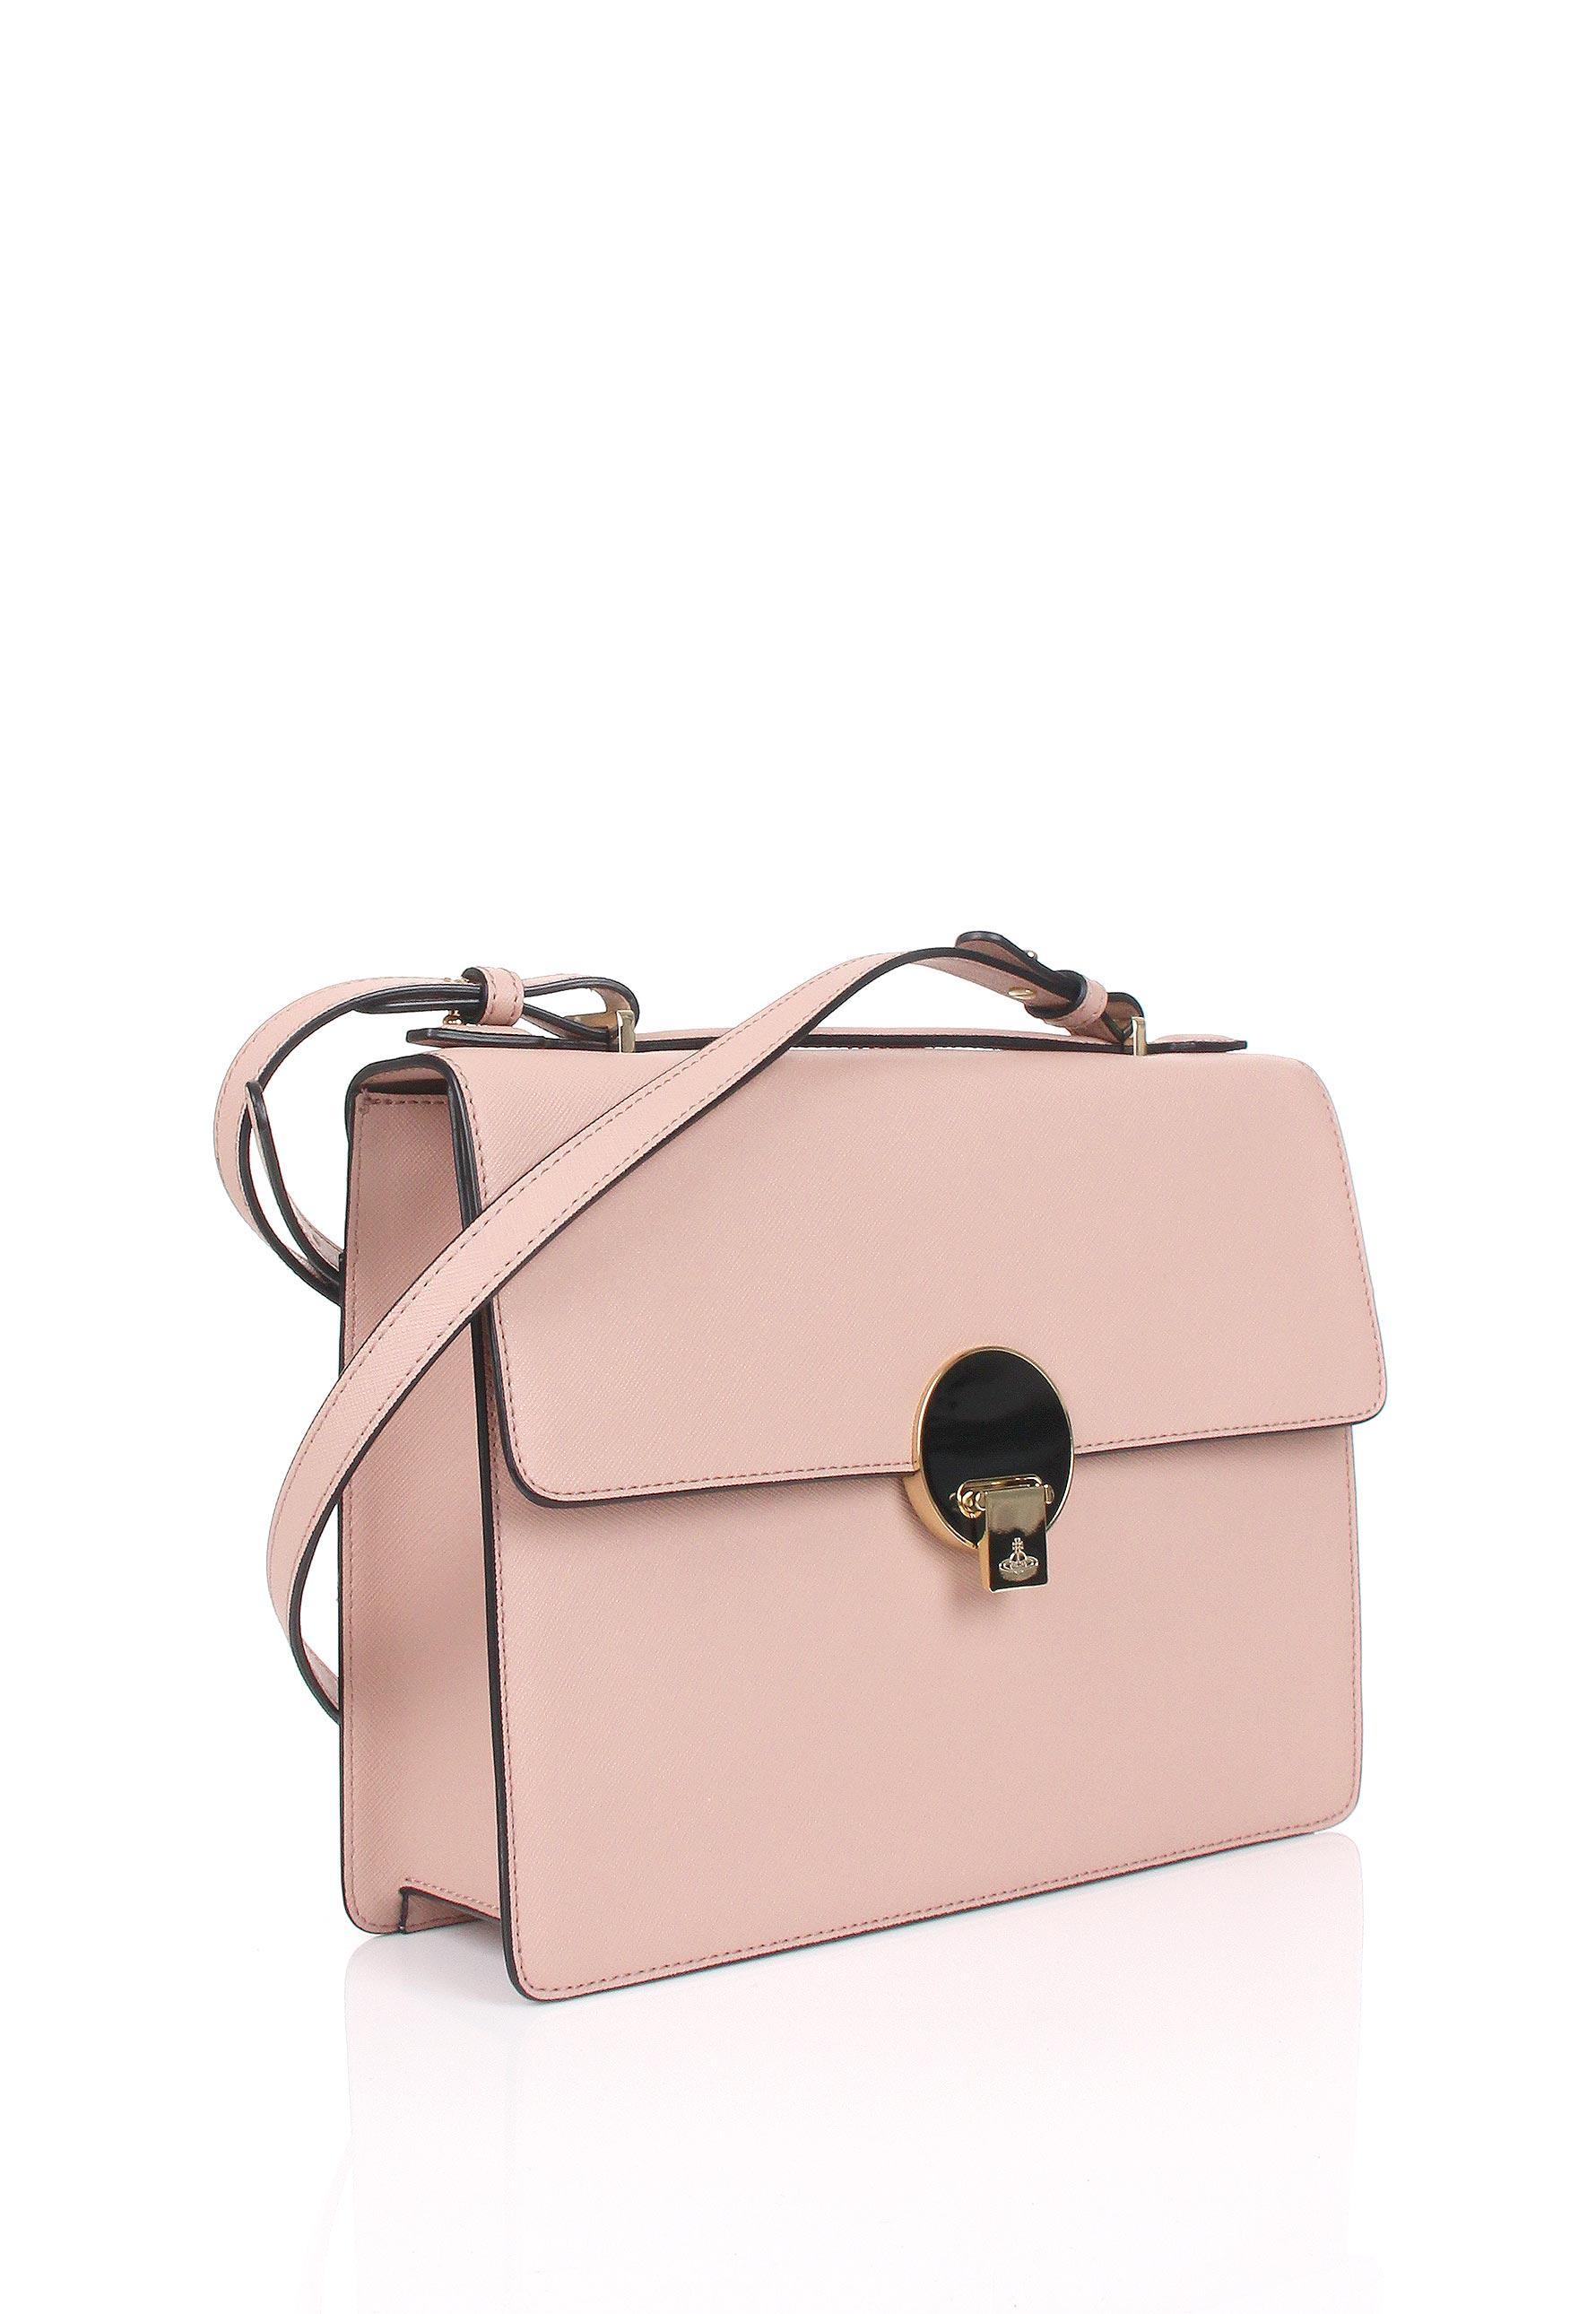 a27b97941e Vivienne Westwood Opio Saffiano 131130 Medium Shoulder Bag Pink in ...